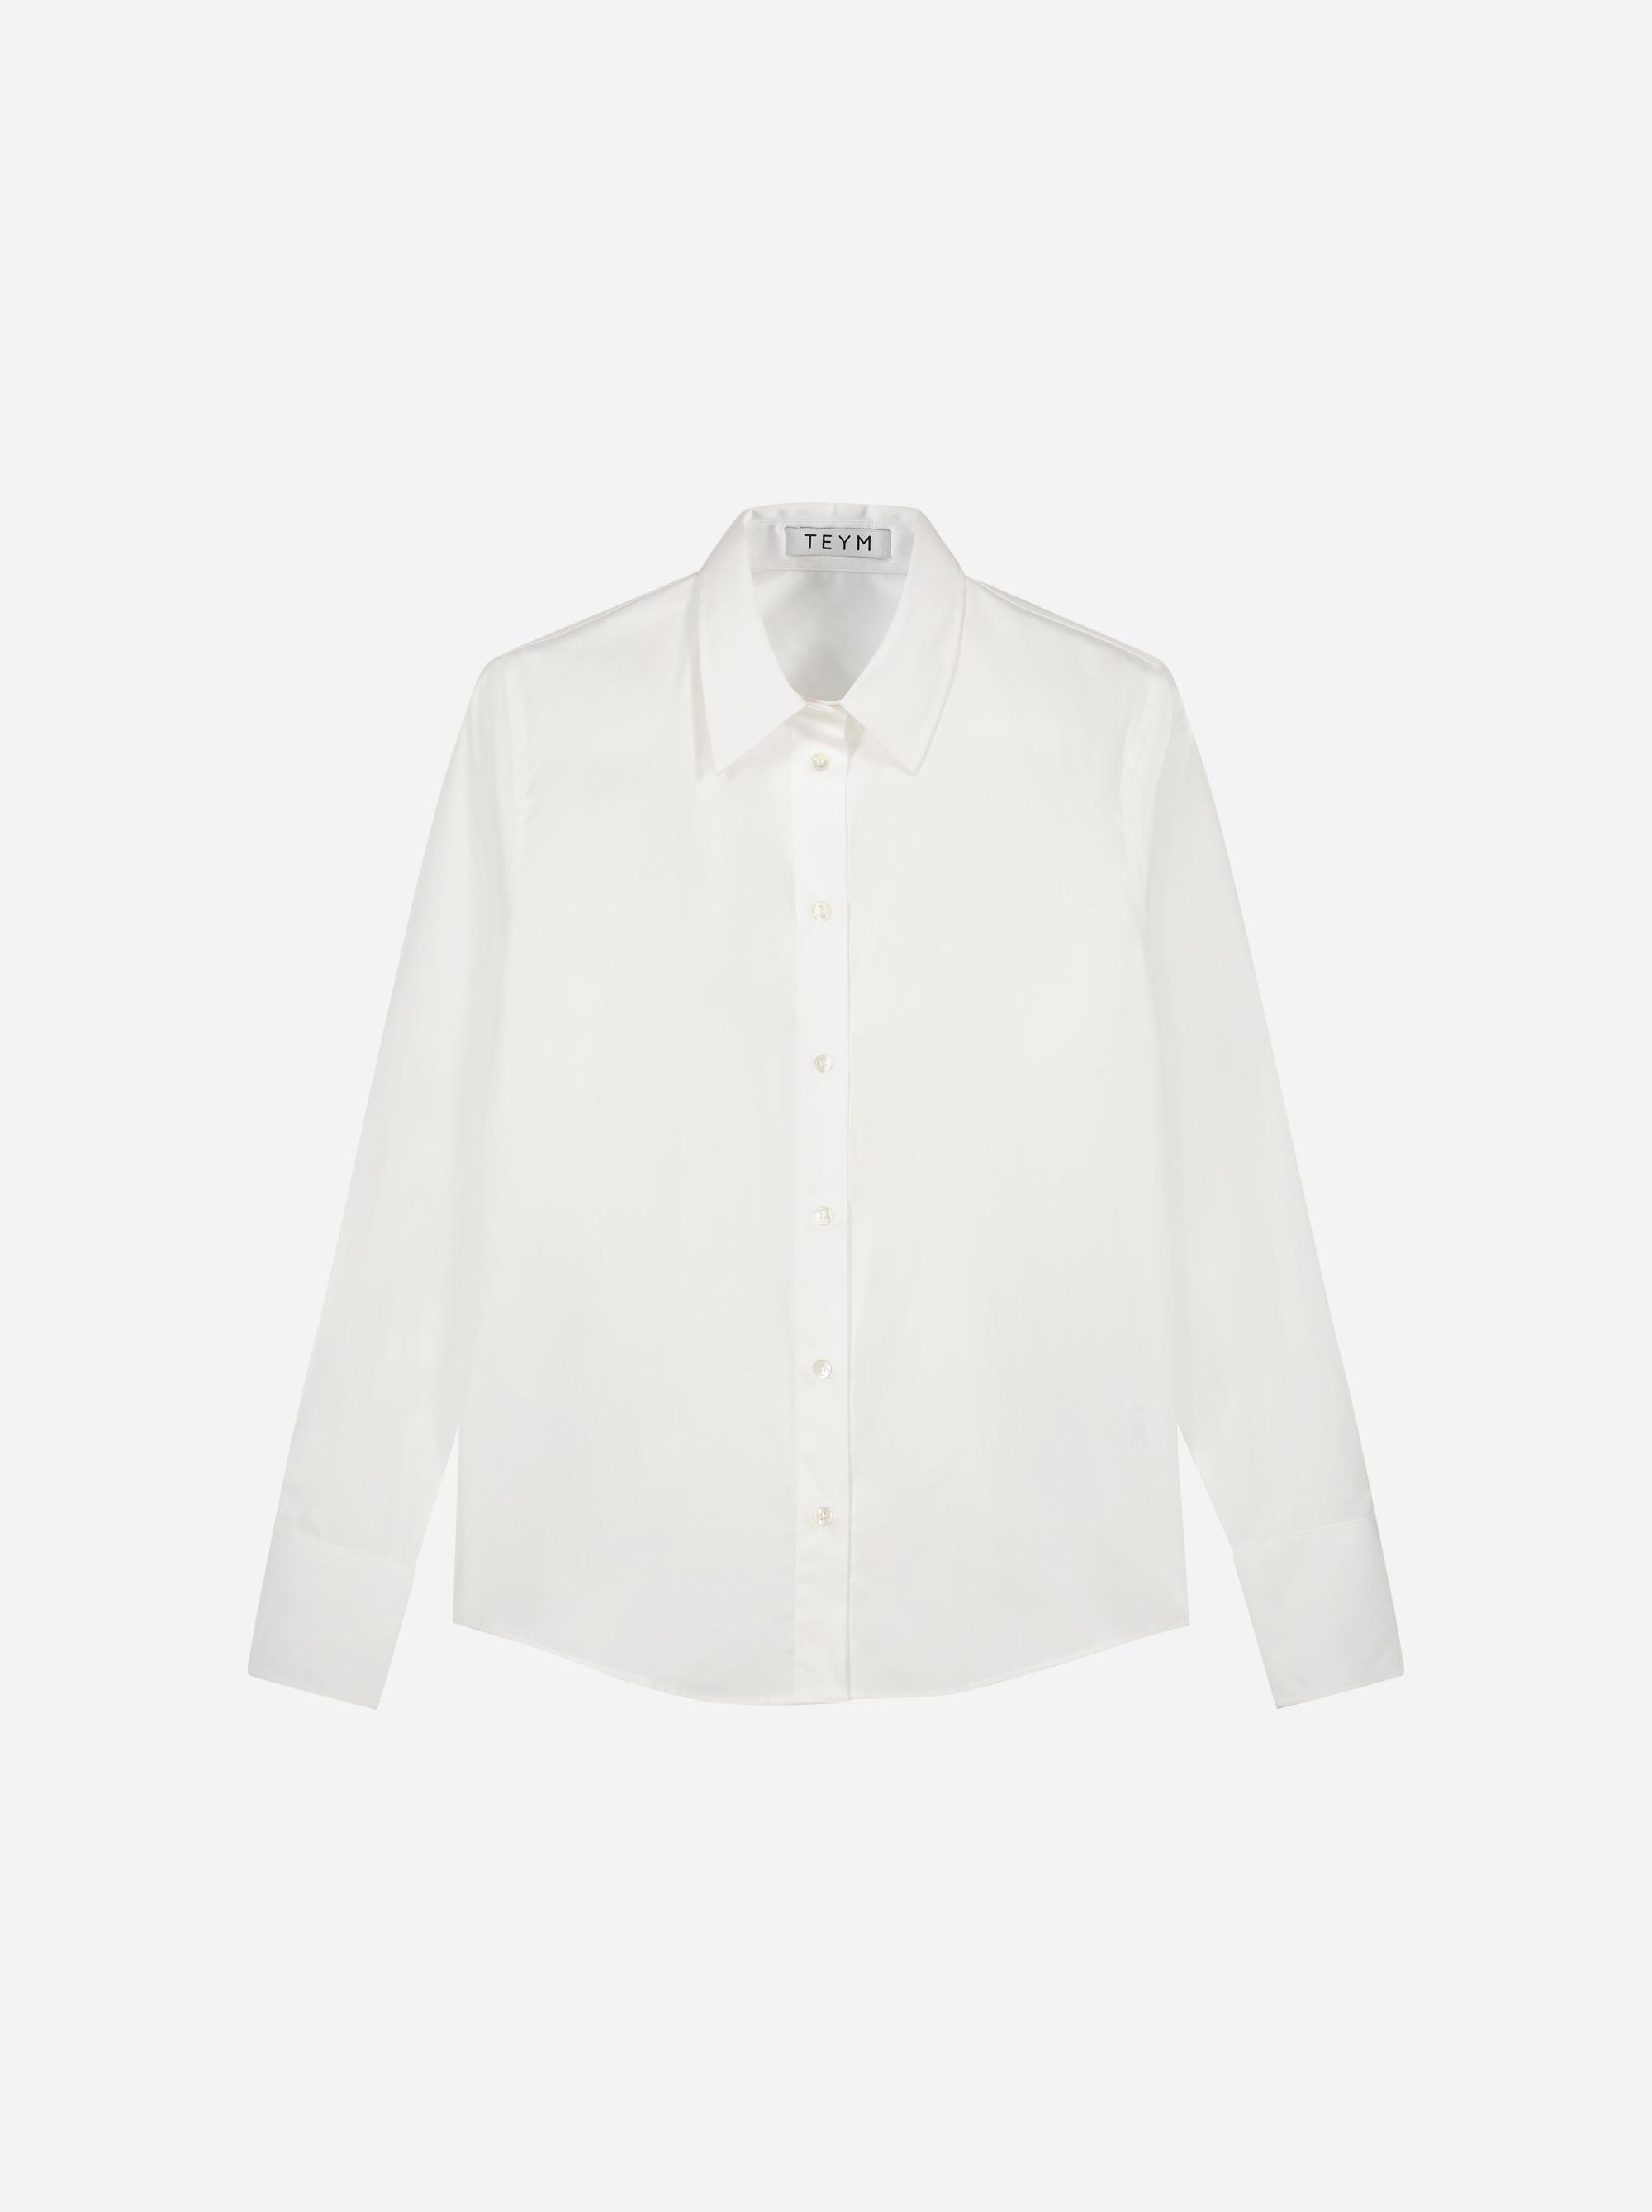 Teym_Shirt_White_Women_front_1B